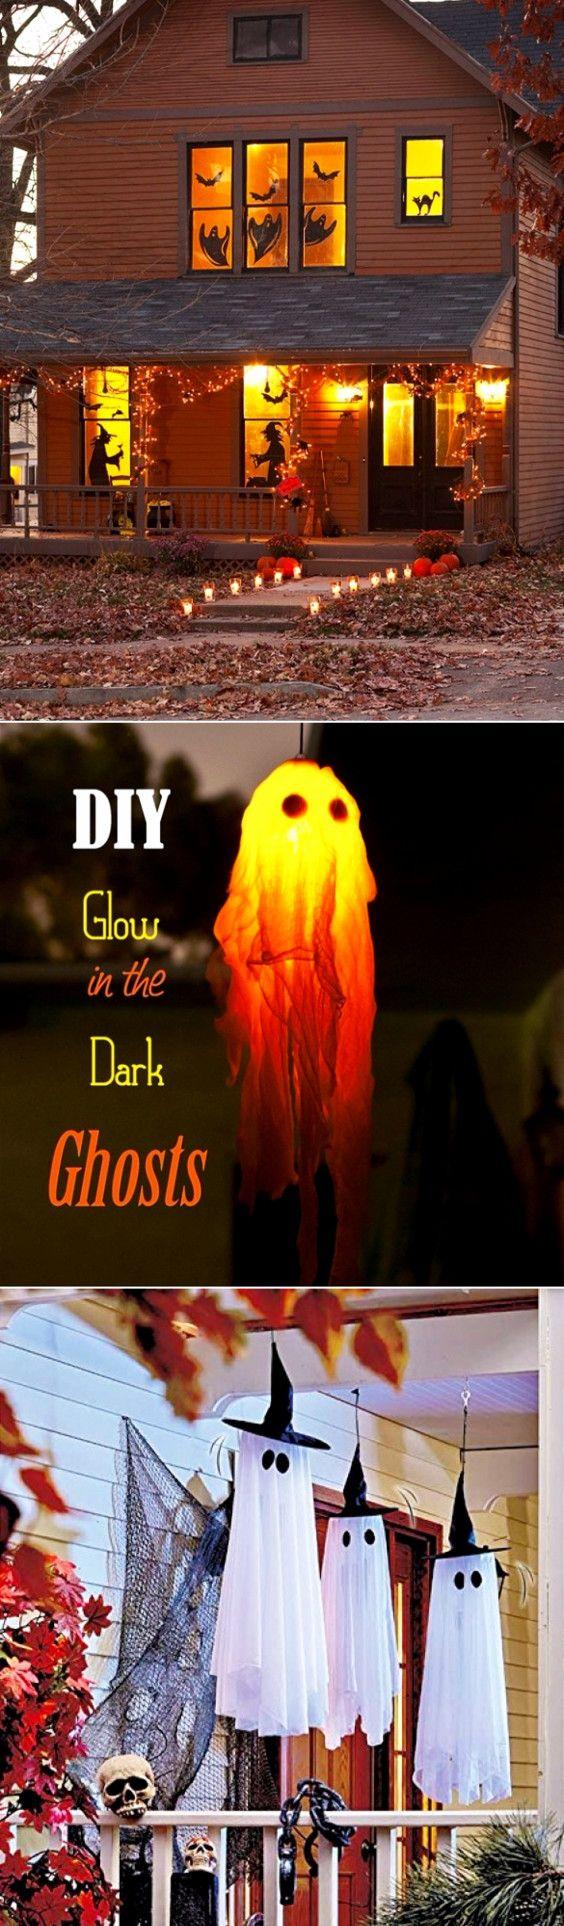 DIY Scary Halloween Decorations Diy outdoor halloween decorations - cool homemade halloween decorations